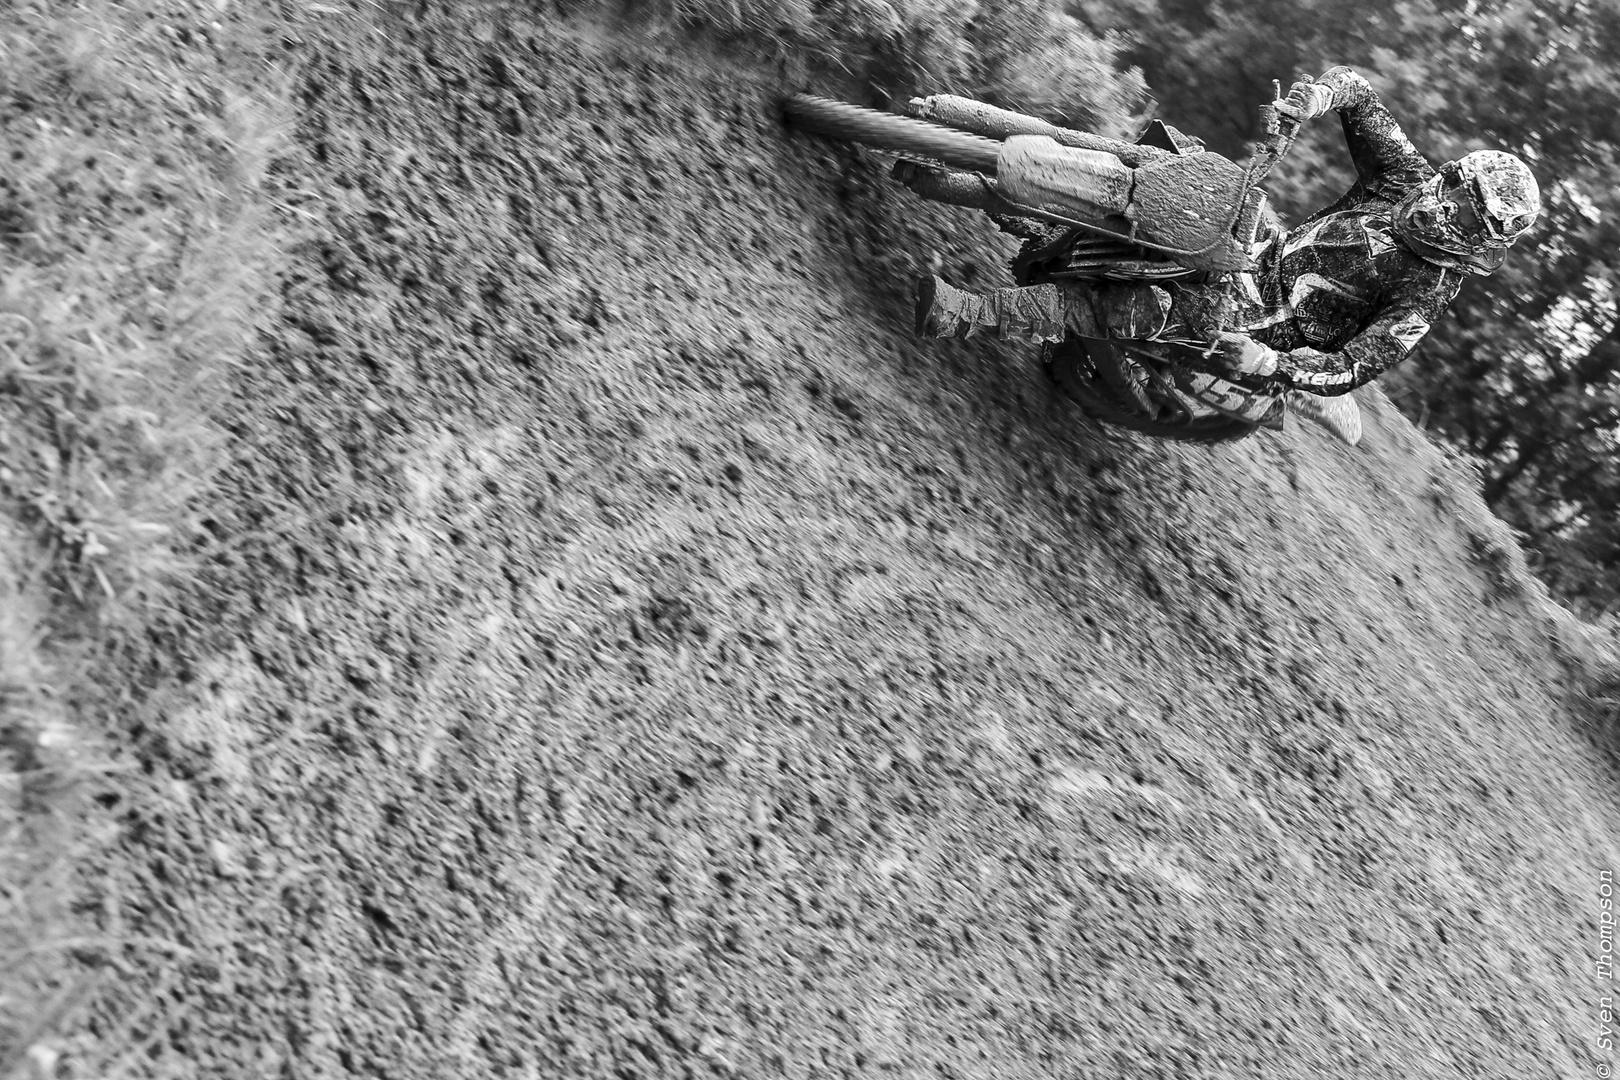 Moto Cross I